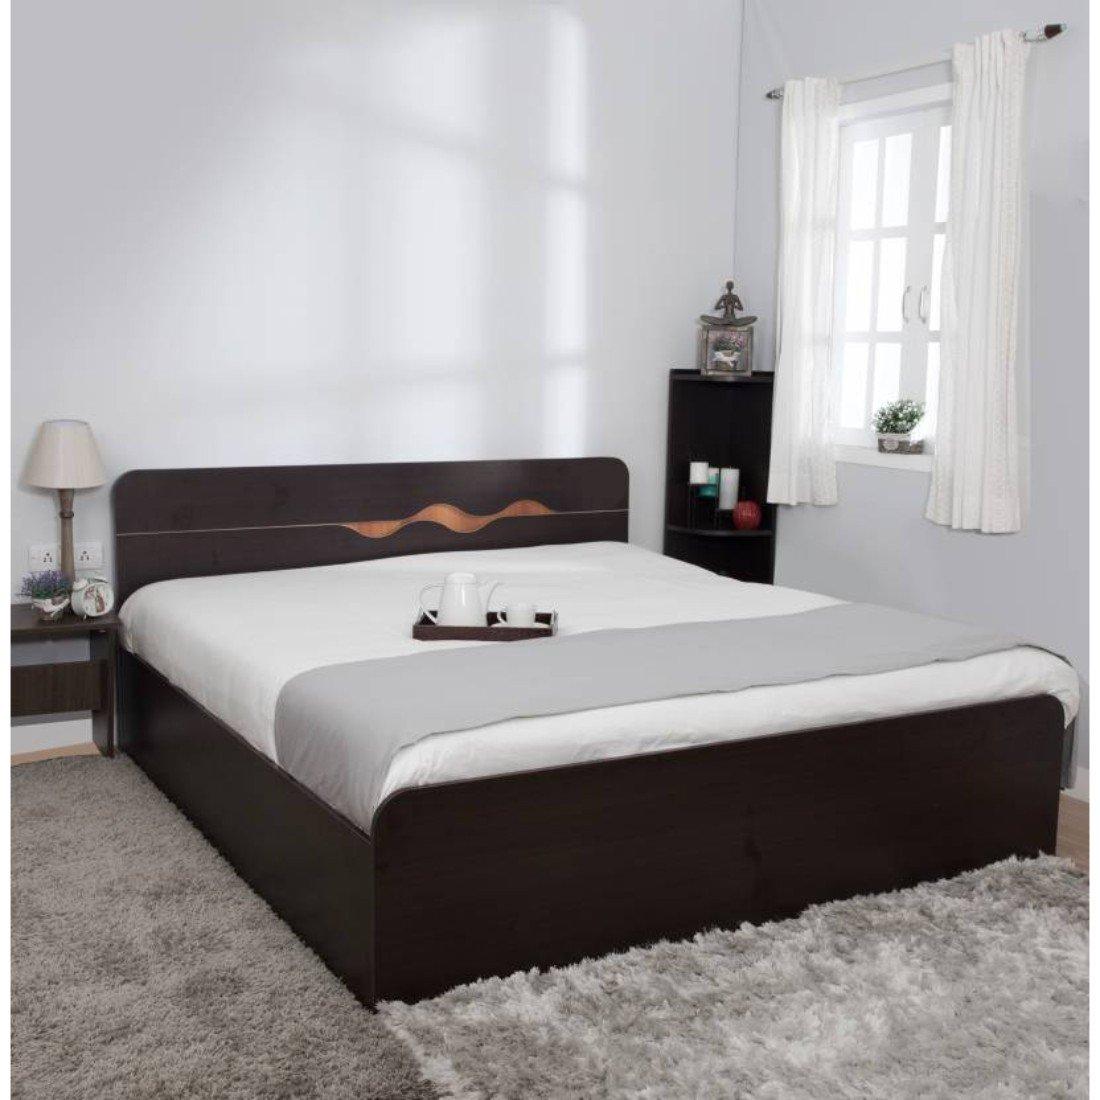 Hometown Swirl King Bed With Box Storage WENGE